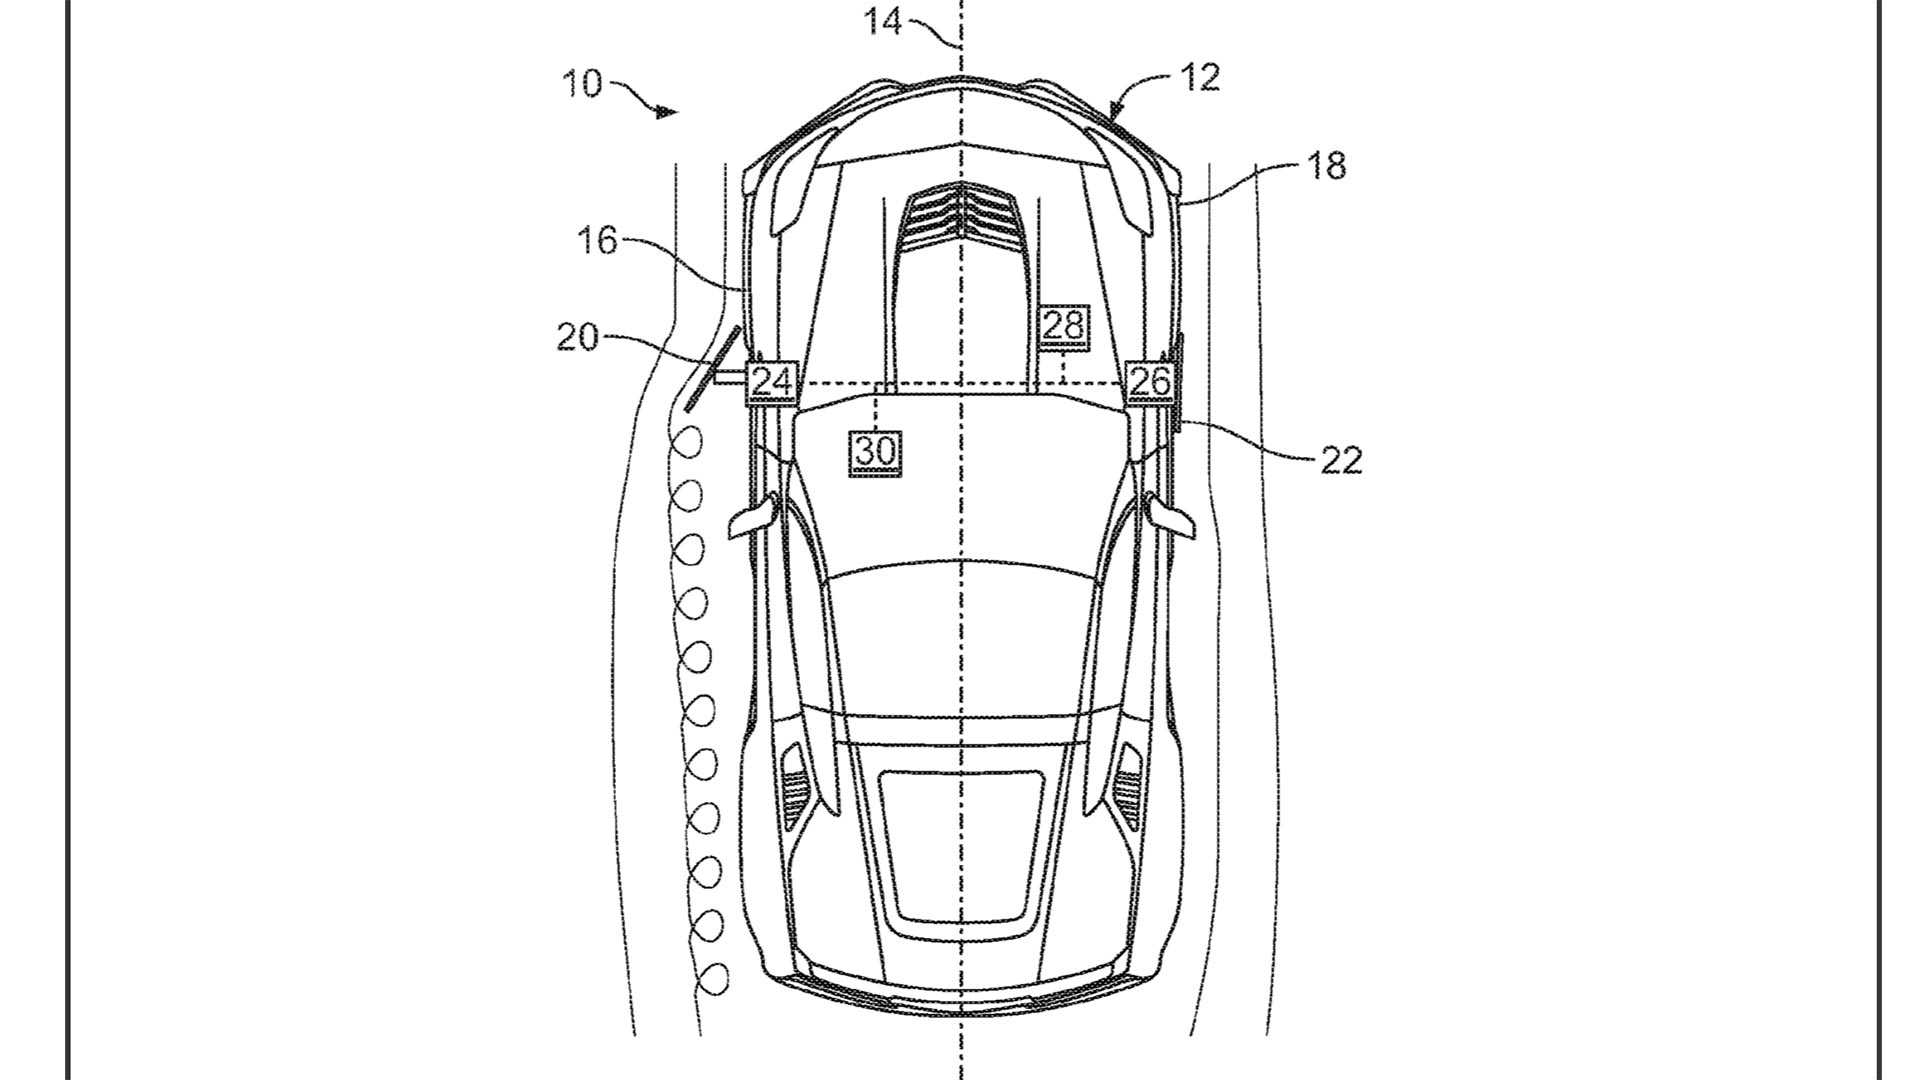 chevrolet-corvette-active-aero-patent_3.jpg